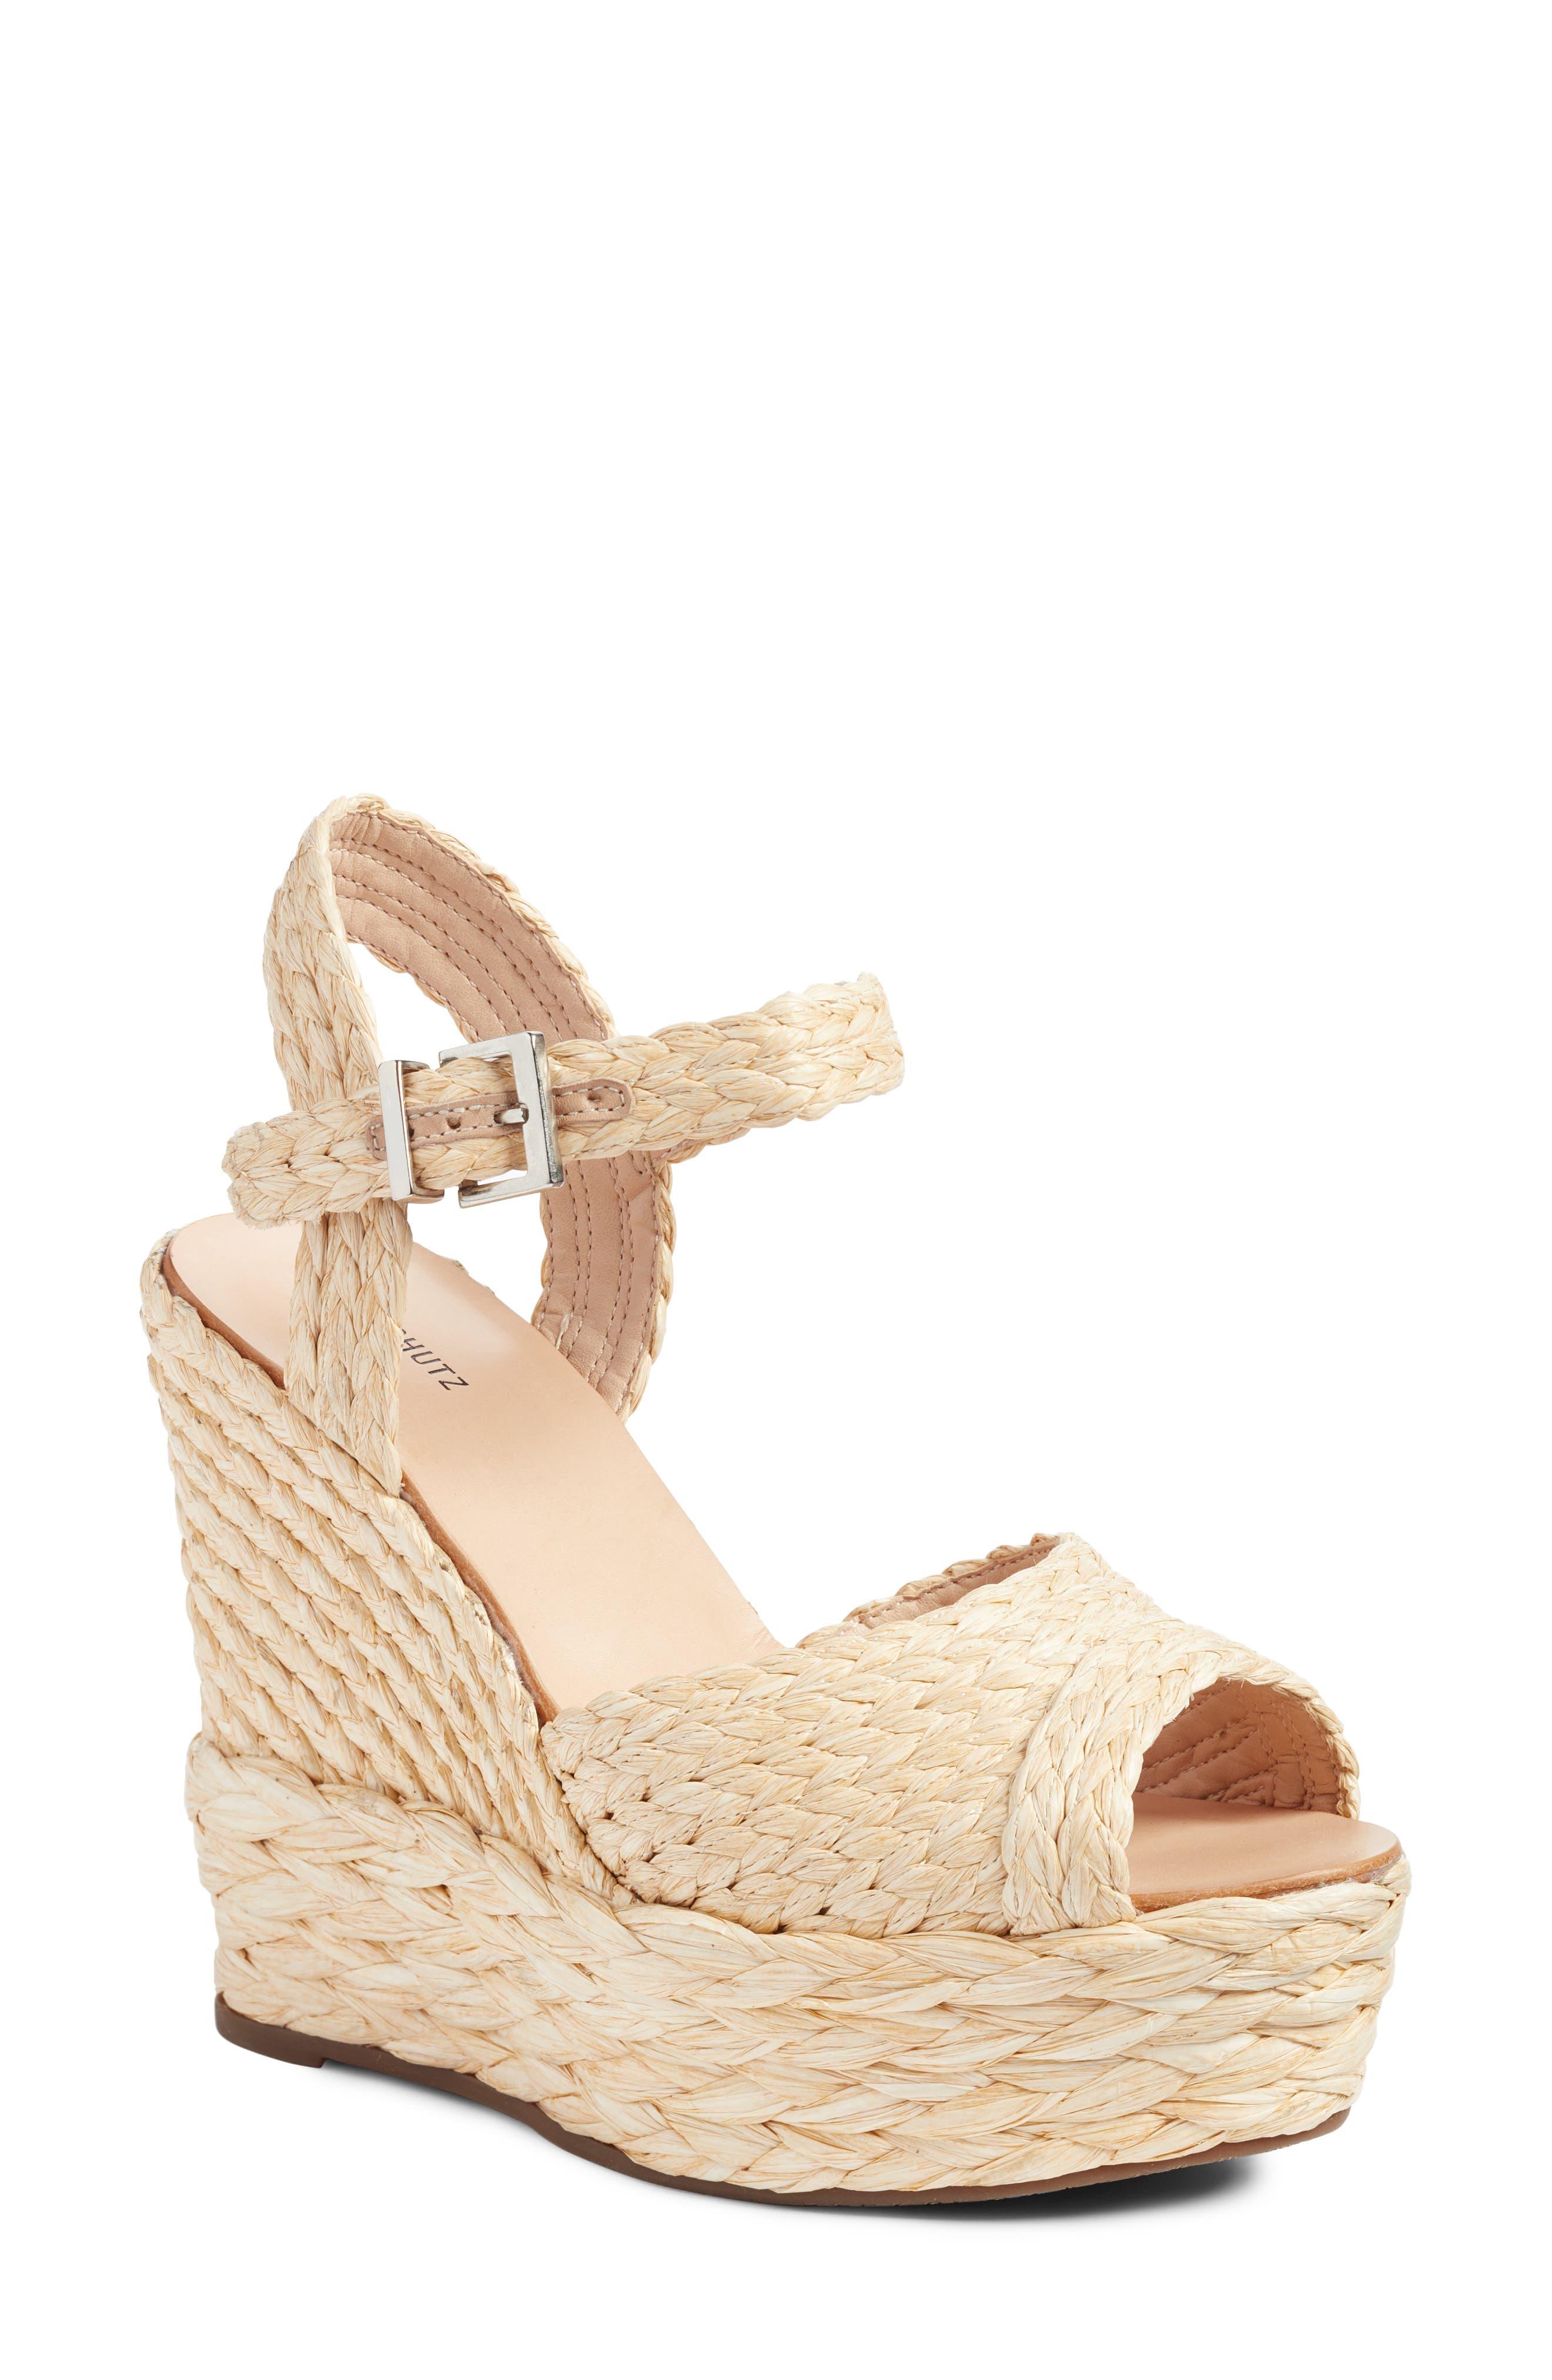 Alternate Image 1 Selected - Schutz Belatrix Platform Wedge Sandal (Women)